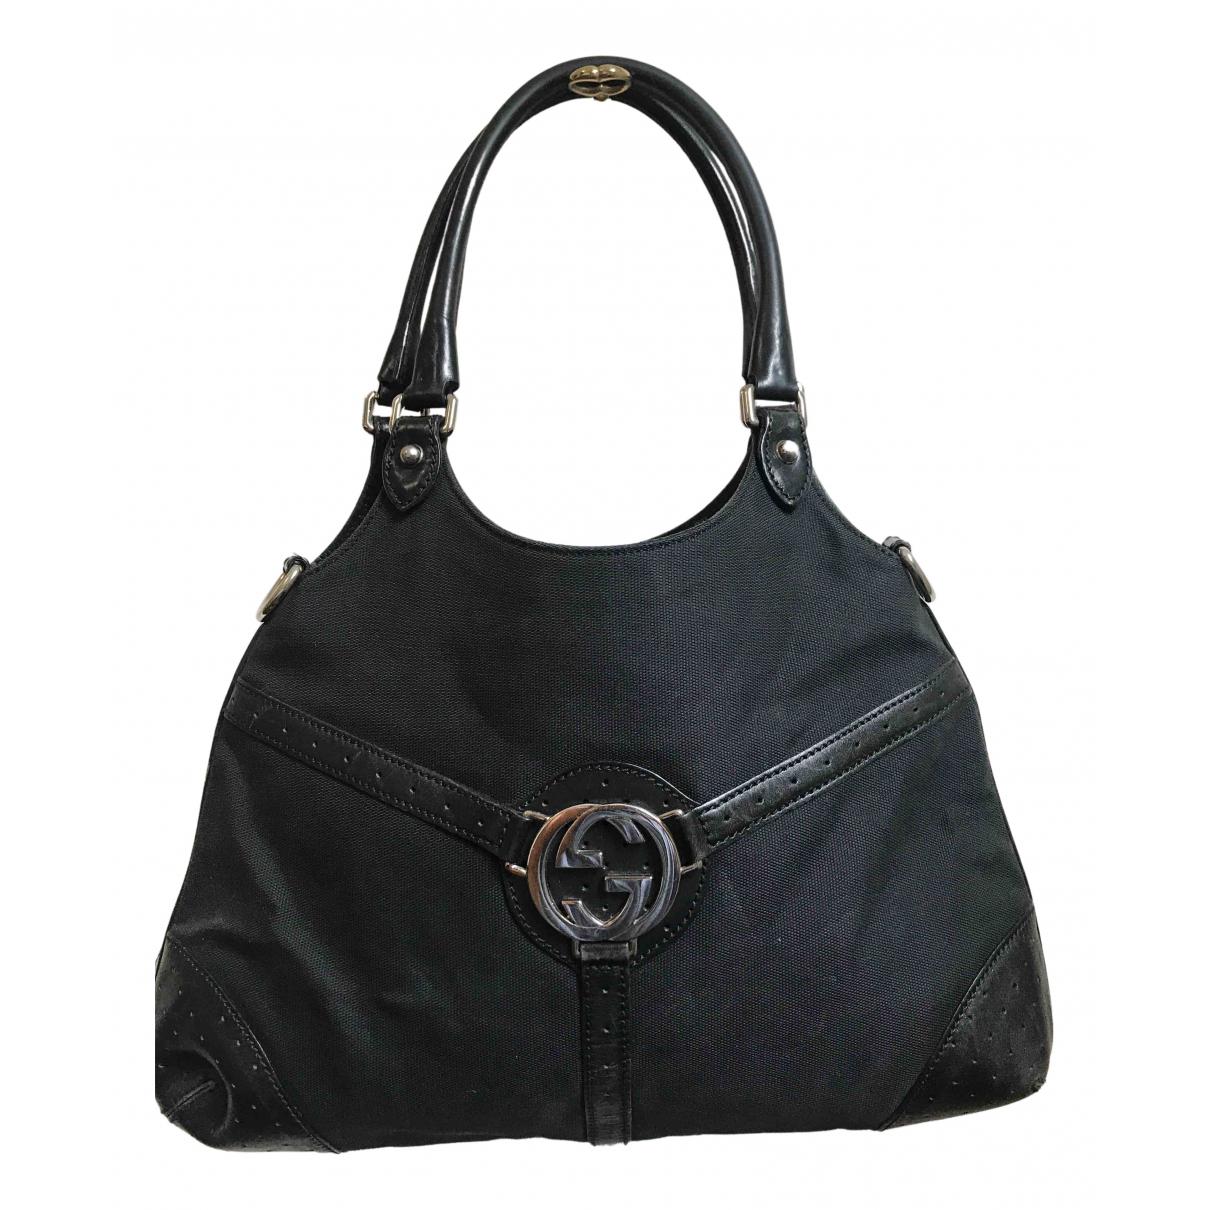 Gucci N Black Cotton handbag for Women N